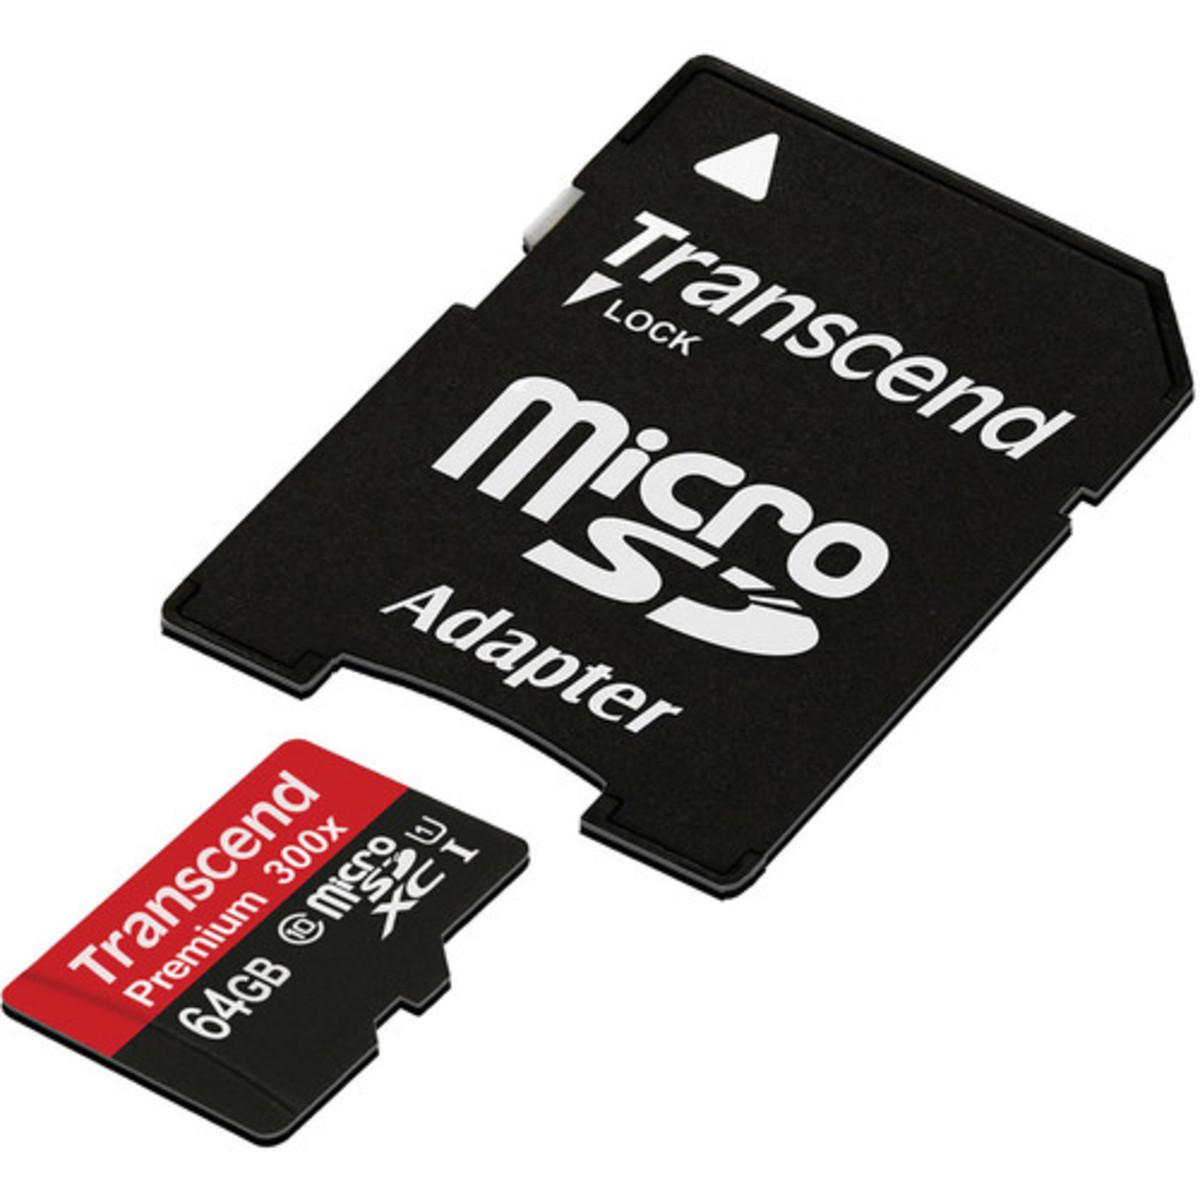 Transcend 64GB Micro SDXC Class 10 UHS-1 300X